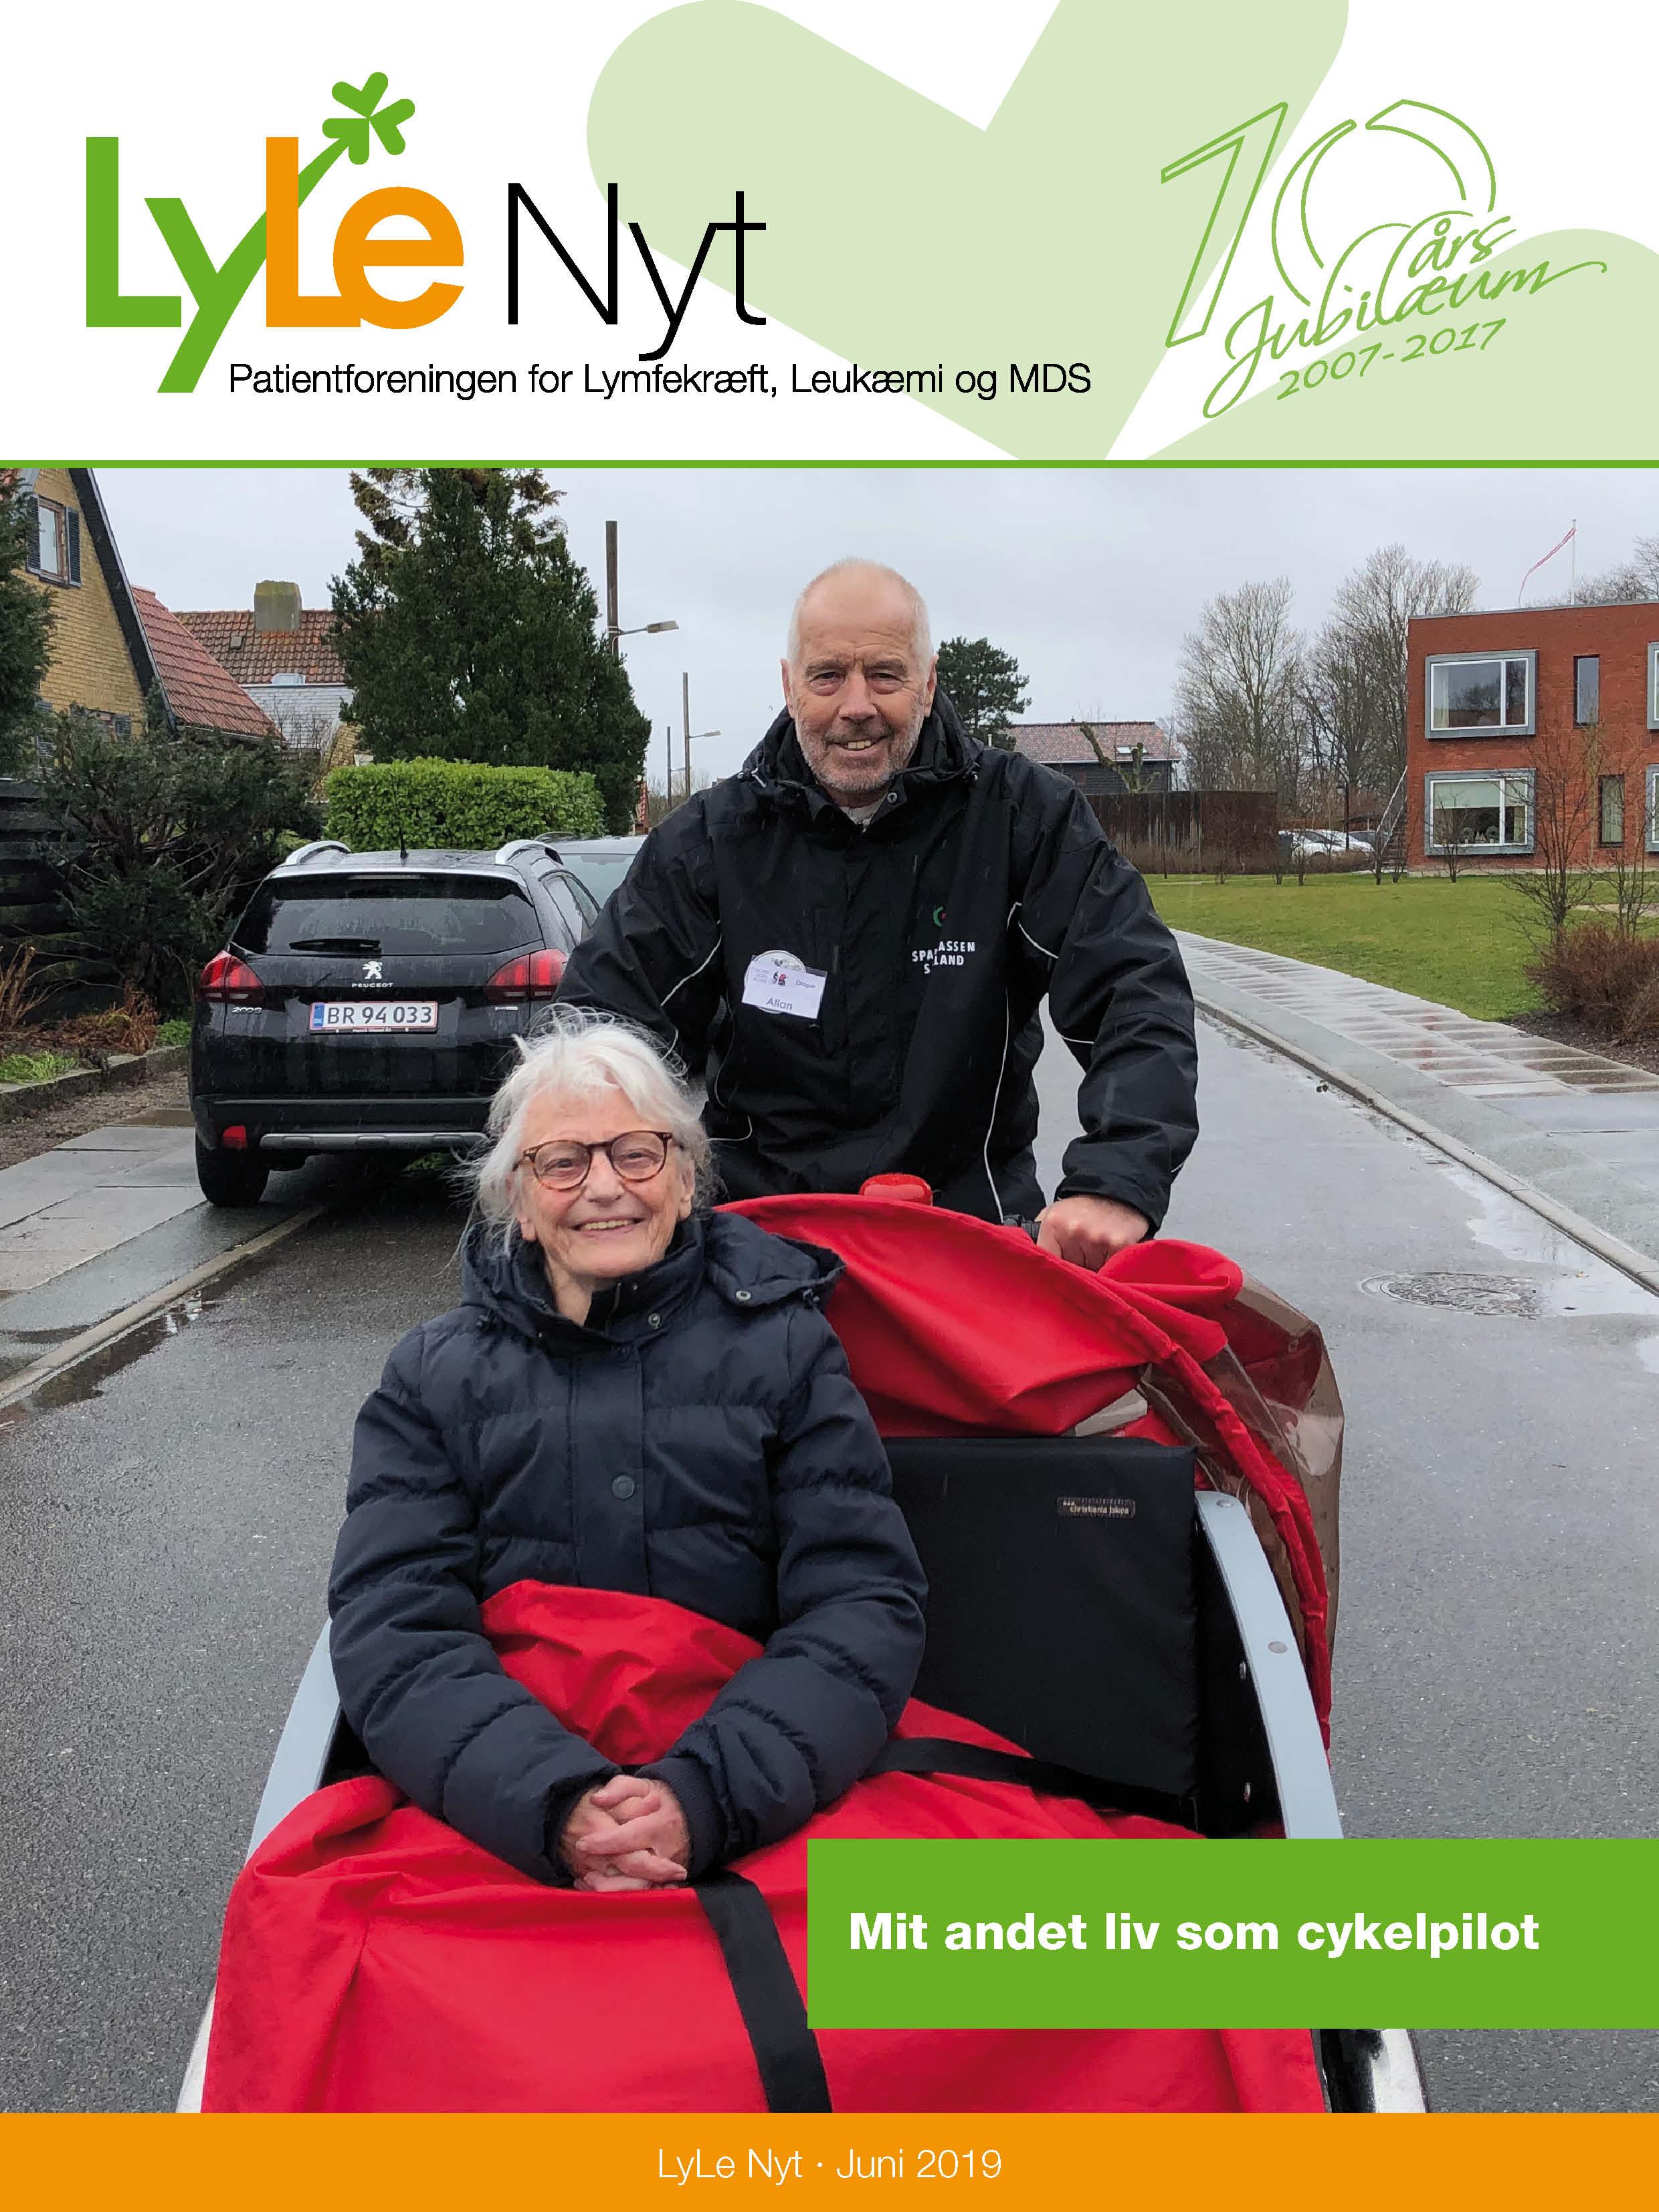 LyLe Nyt, december 2018